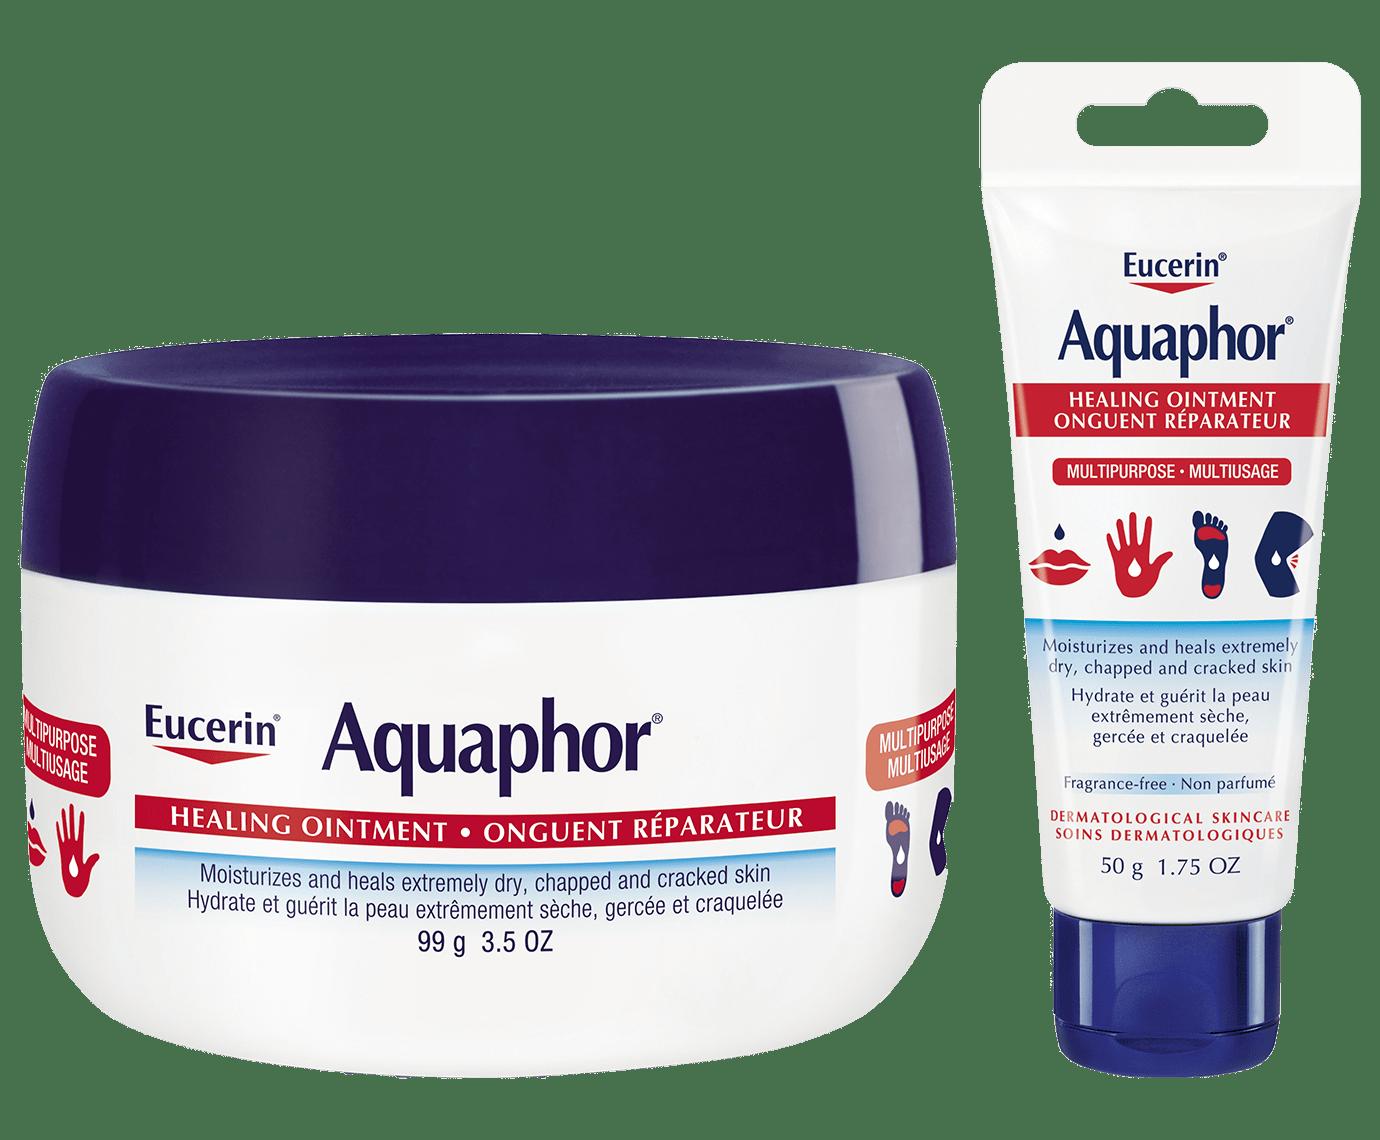 Eucerin Aquaphor Skin Protectant Ointment Damaged Skin